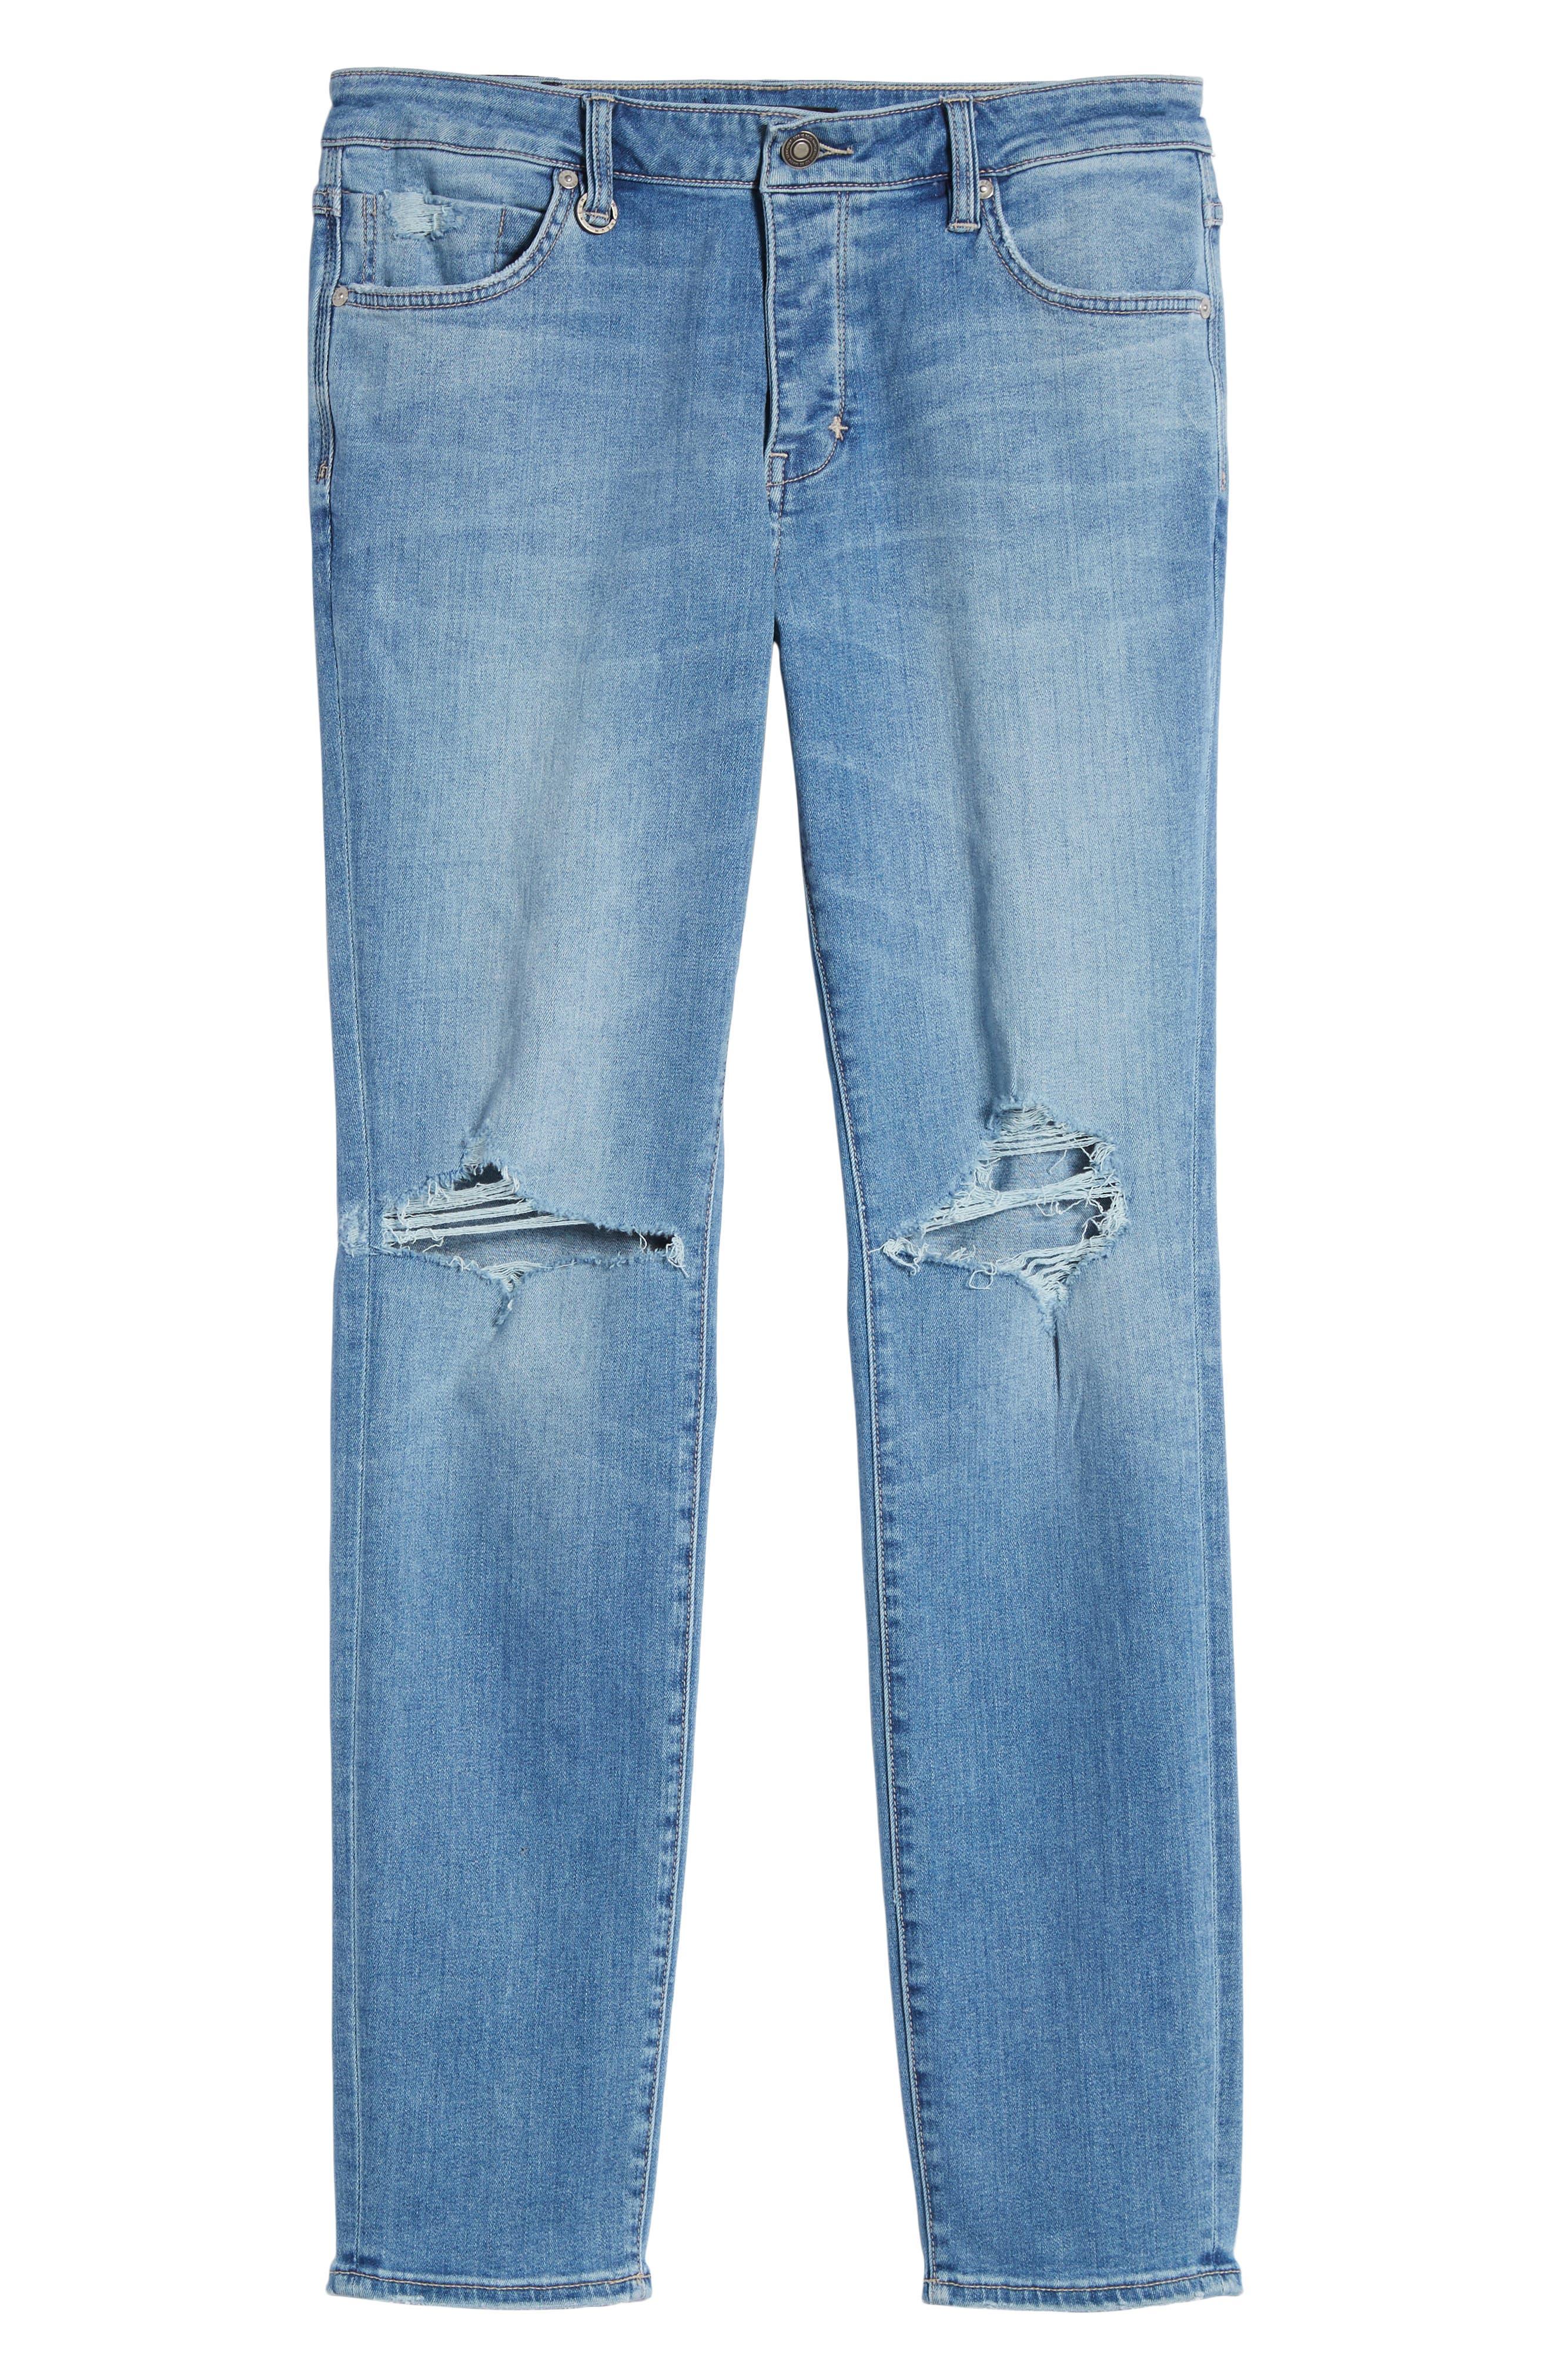 Iggy Skinny Fit Jeans,                             Alternate thumbnail 6, color,                             Broken Lights